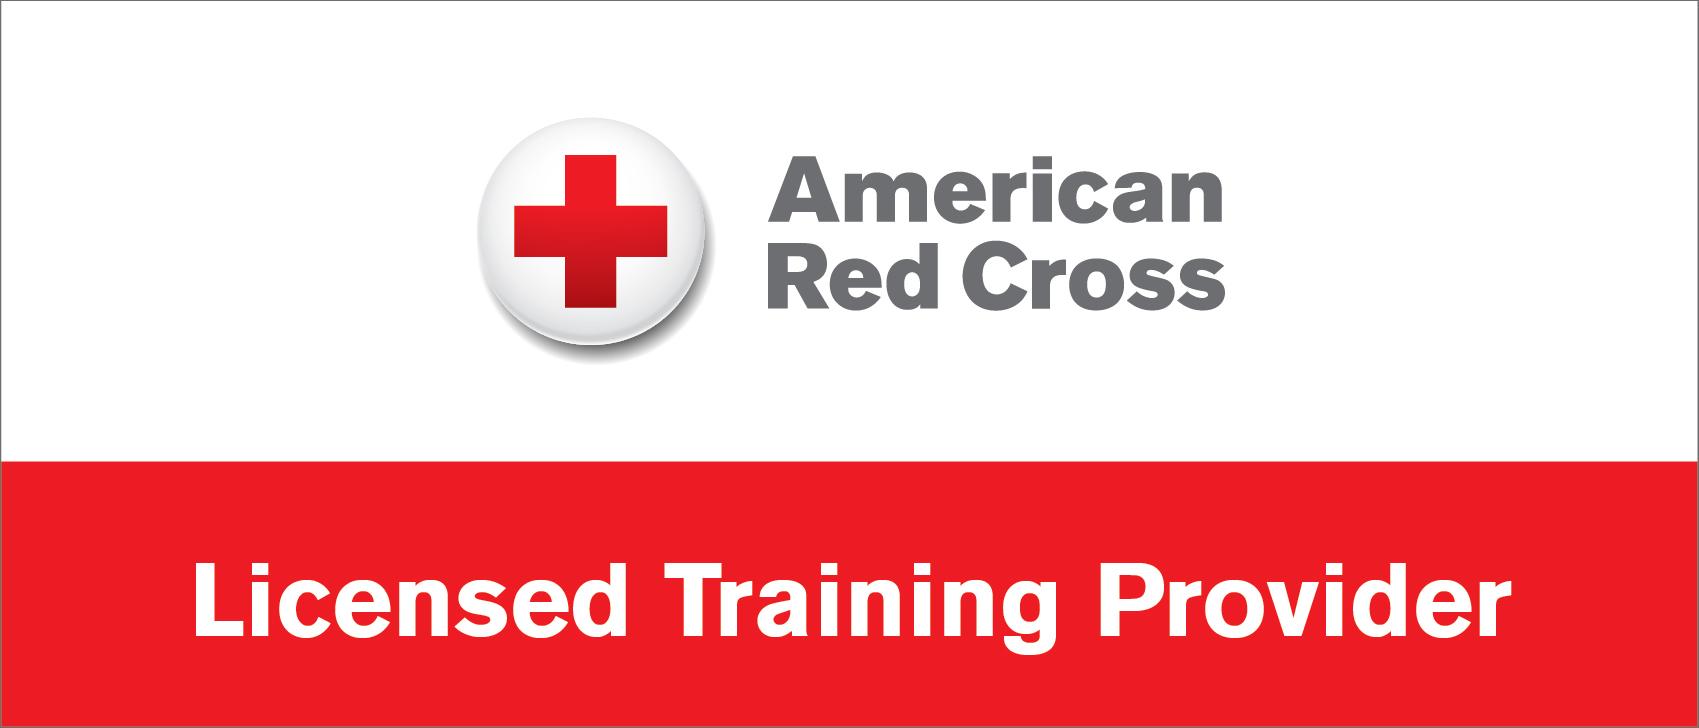 Licensed Training Provider Graphic (April 2021)